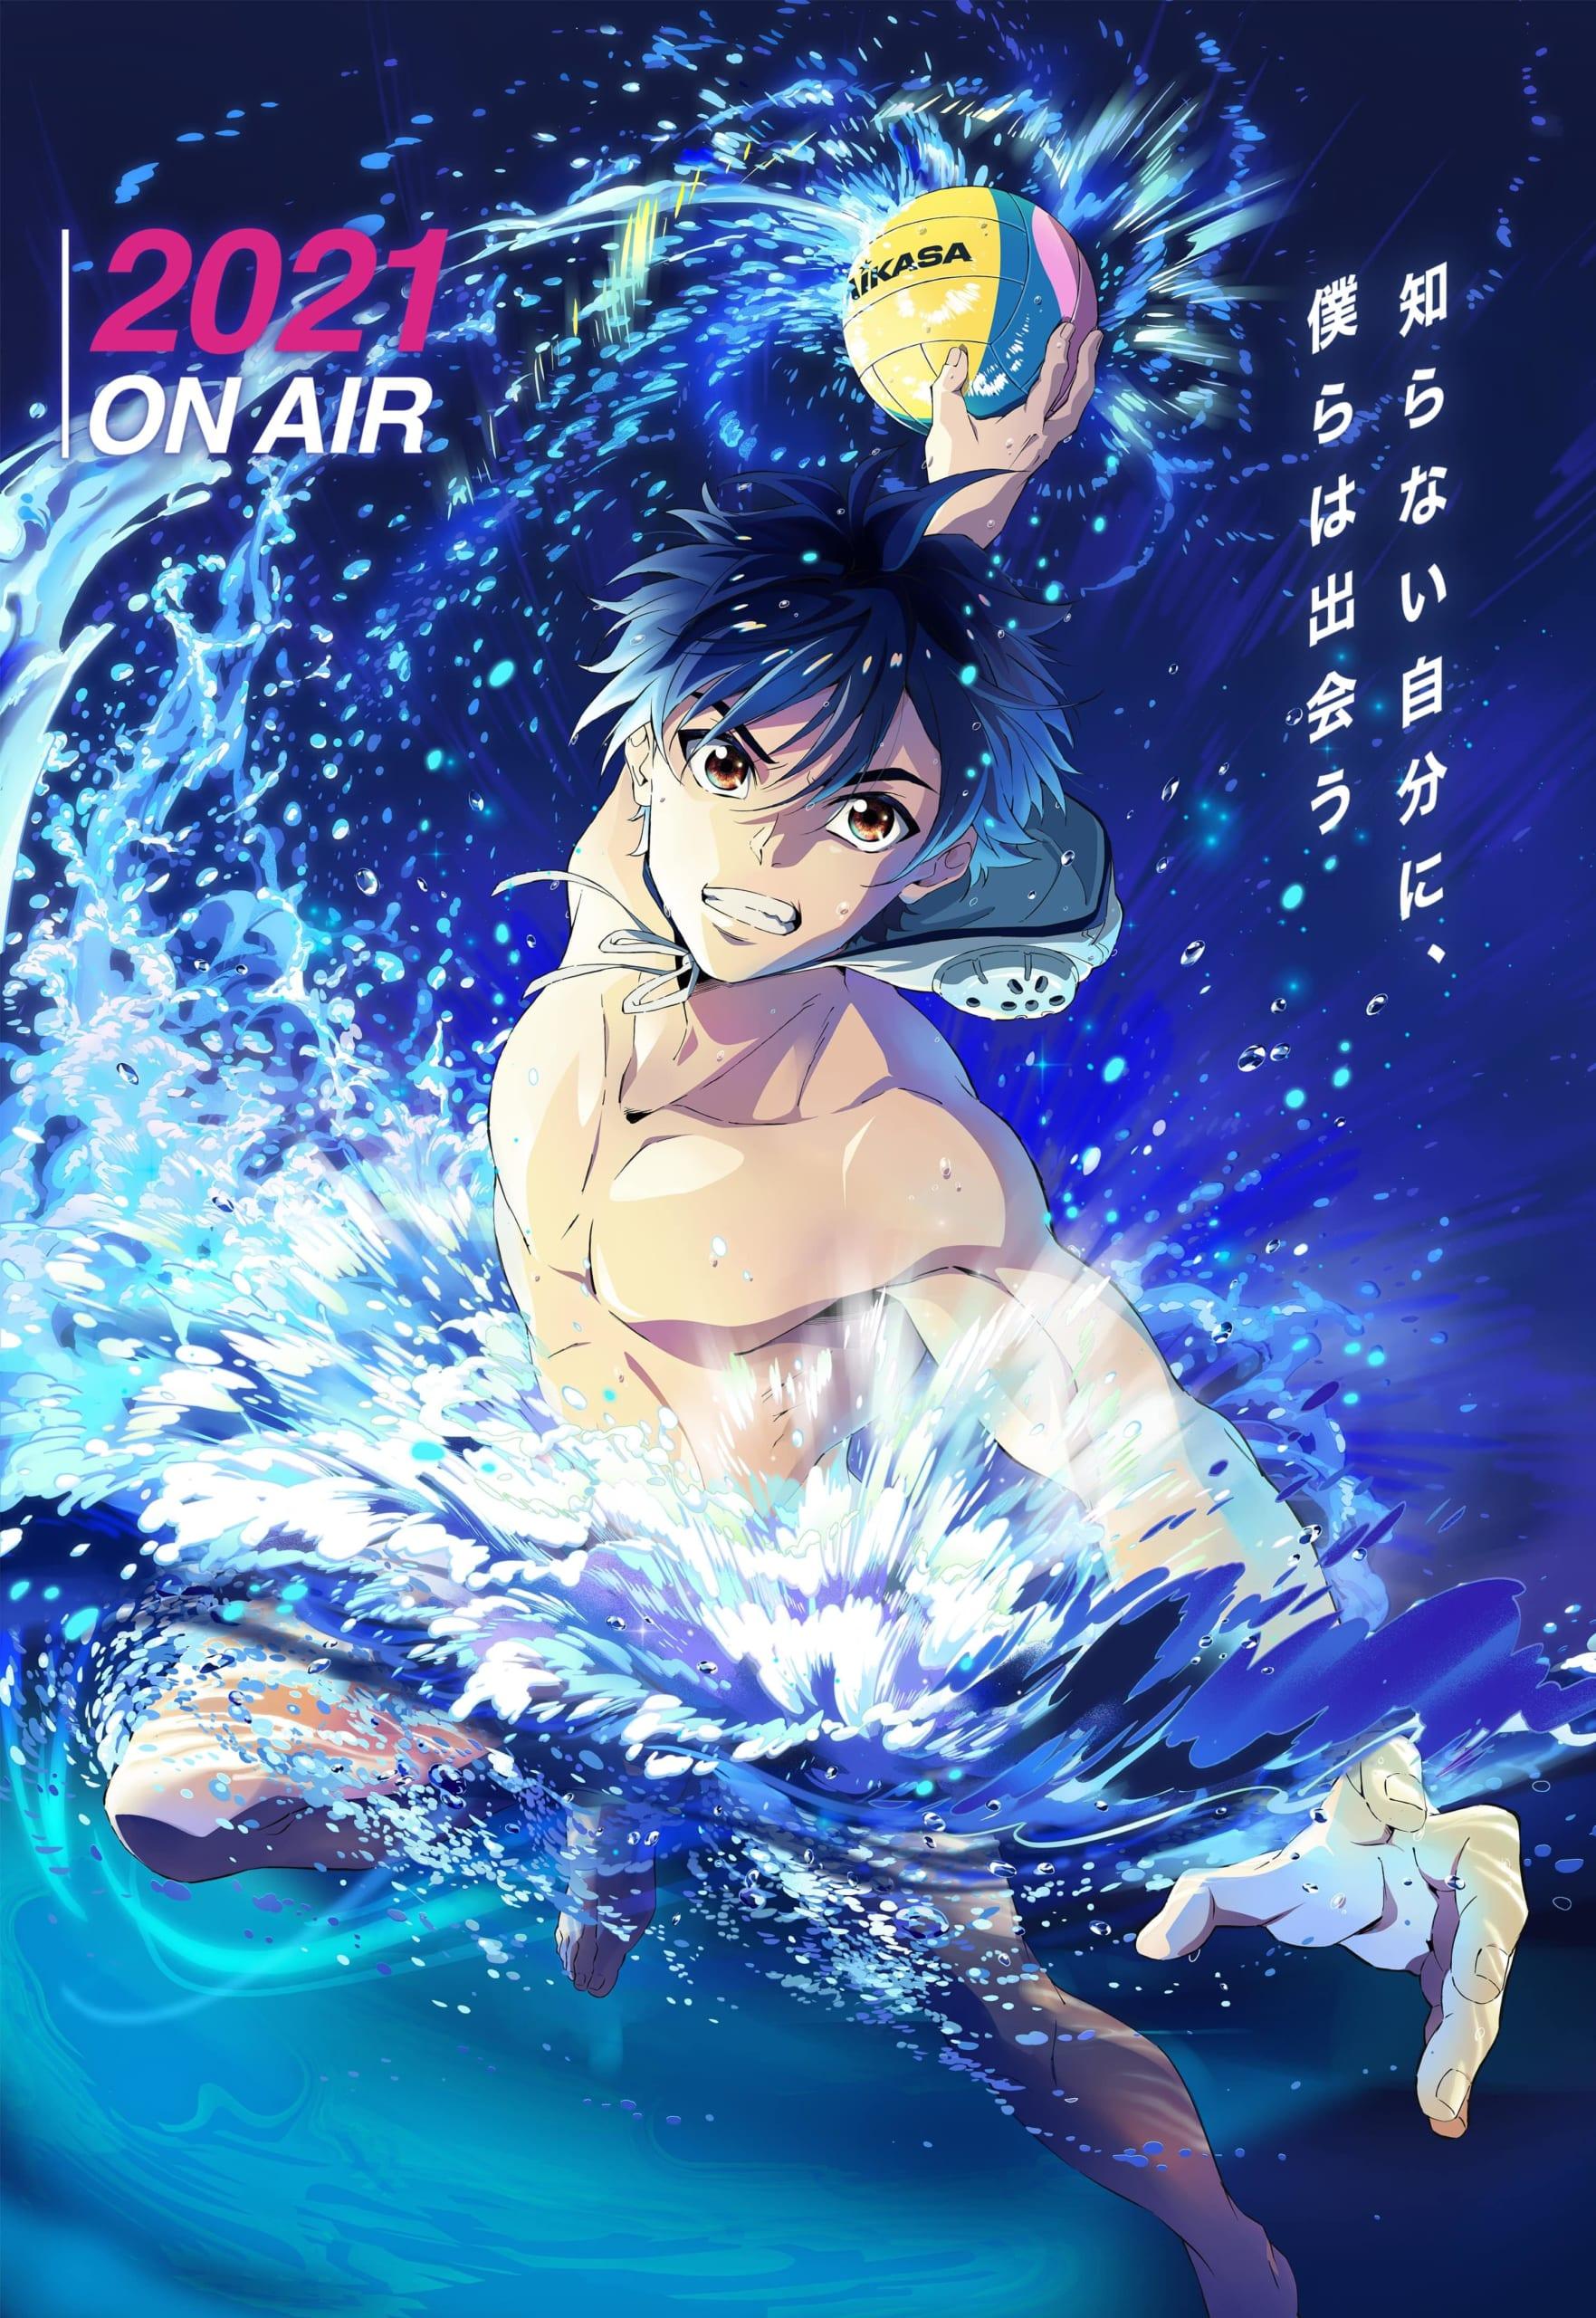 MAPPA制作・水球がテーマの新アニメ「RE-MAIN」2021年放送決定!上村裕翔さん、西山宏太朗さん、木村昴さんらが出演